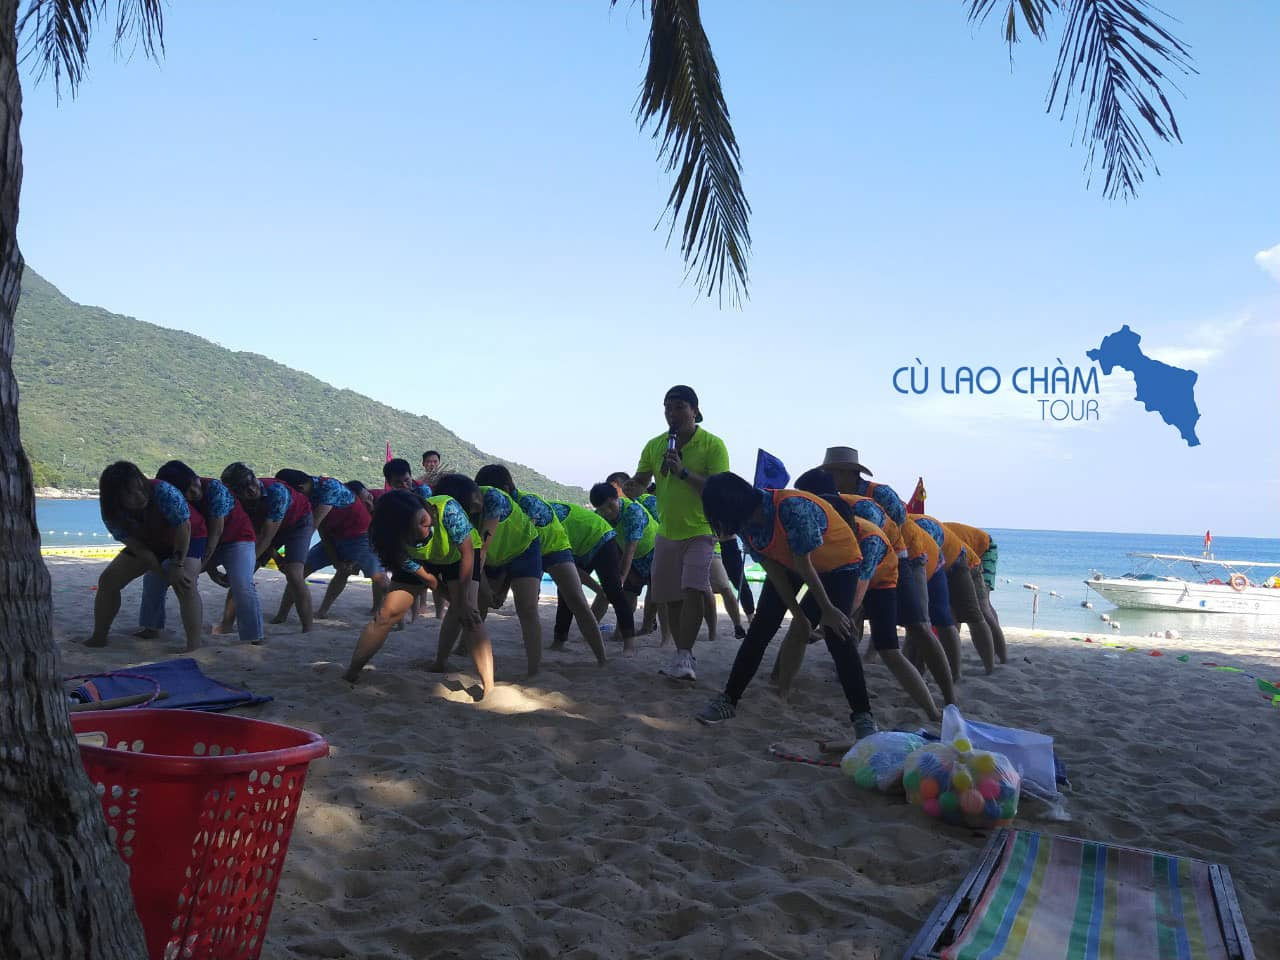 Teambuildingculaocham9